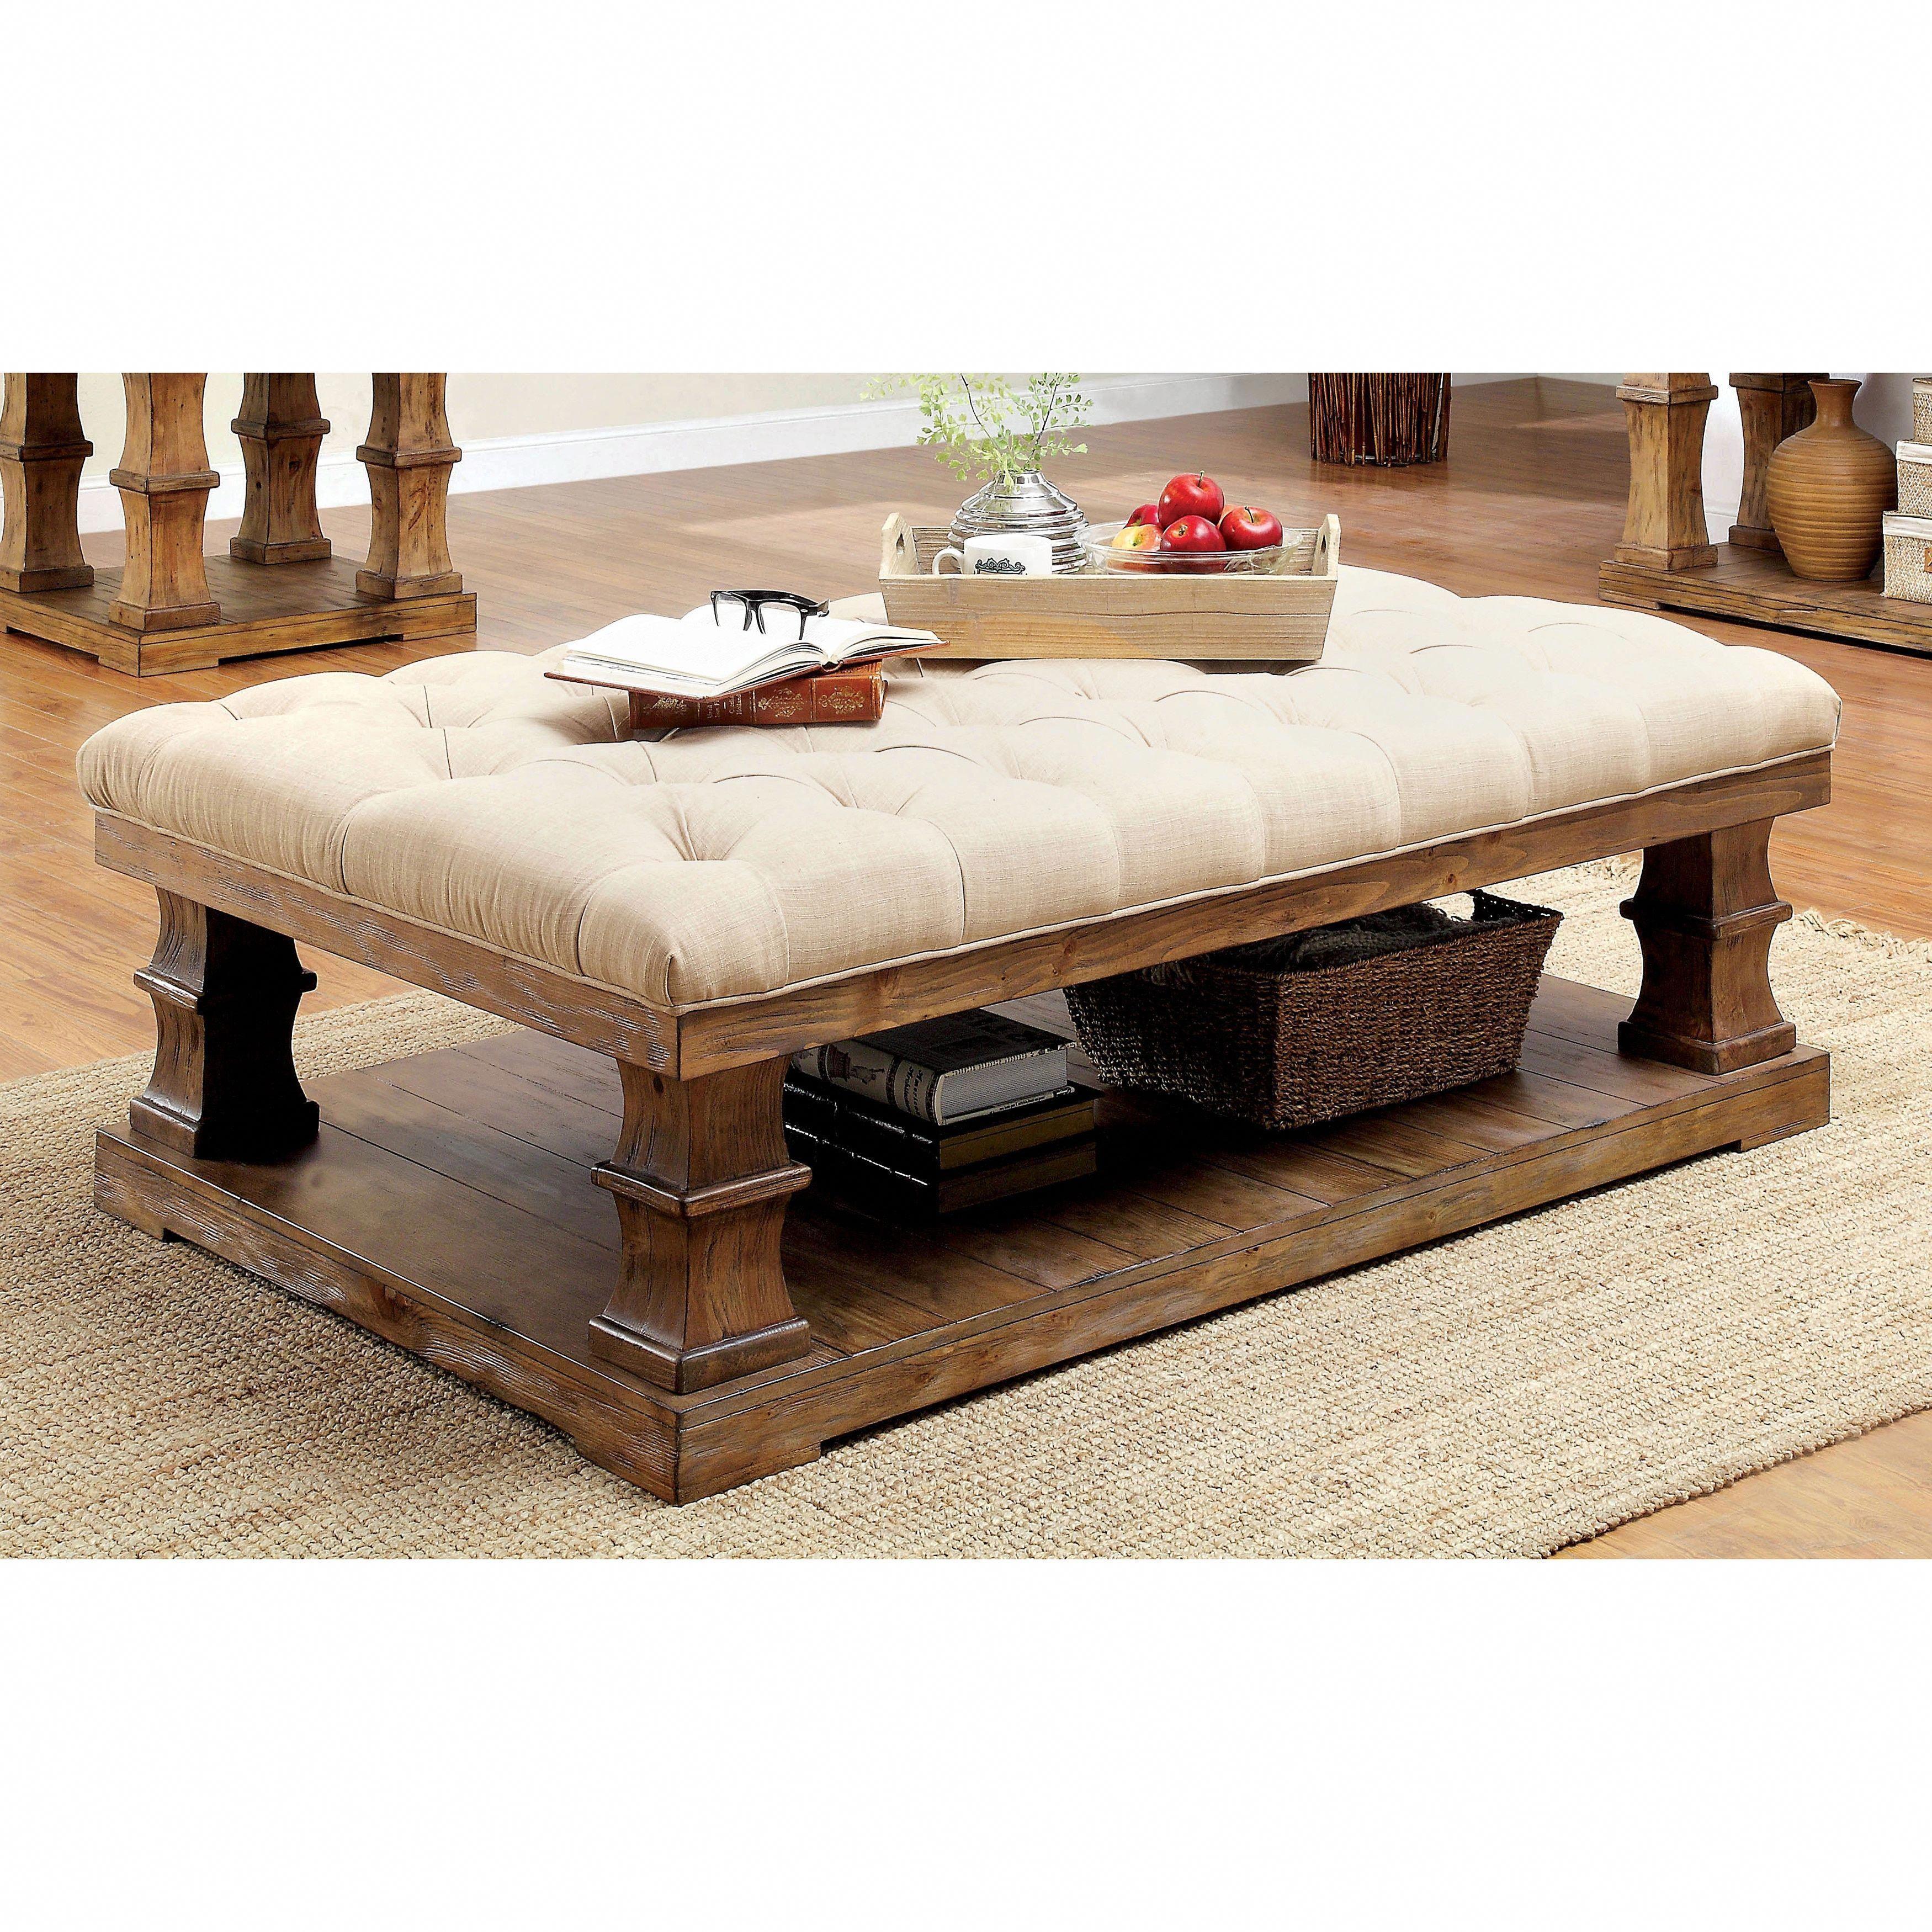 Best Furniture Of America Temecula Rustic Farmhouse Tufted 400 x 300